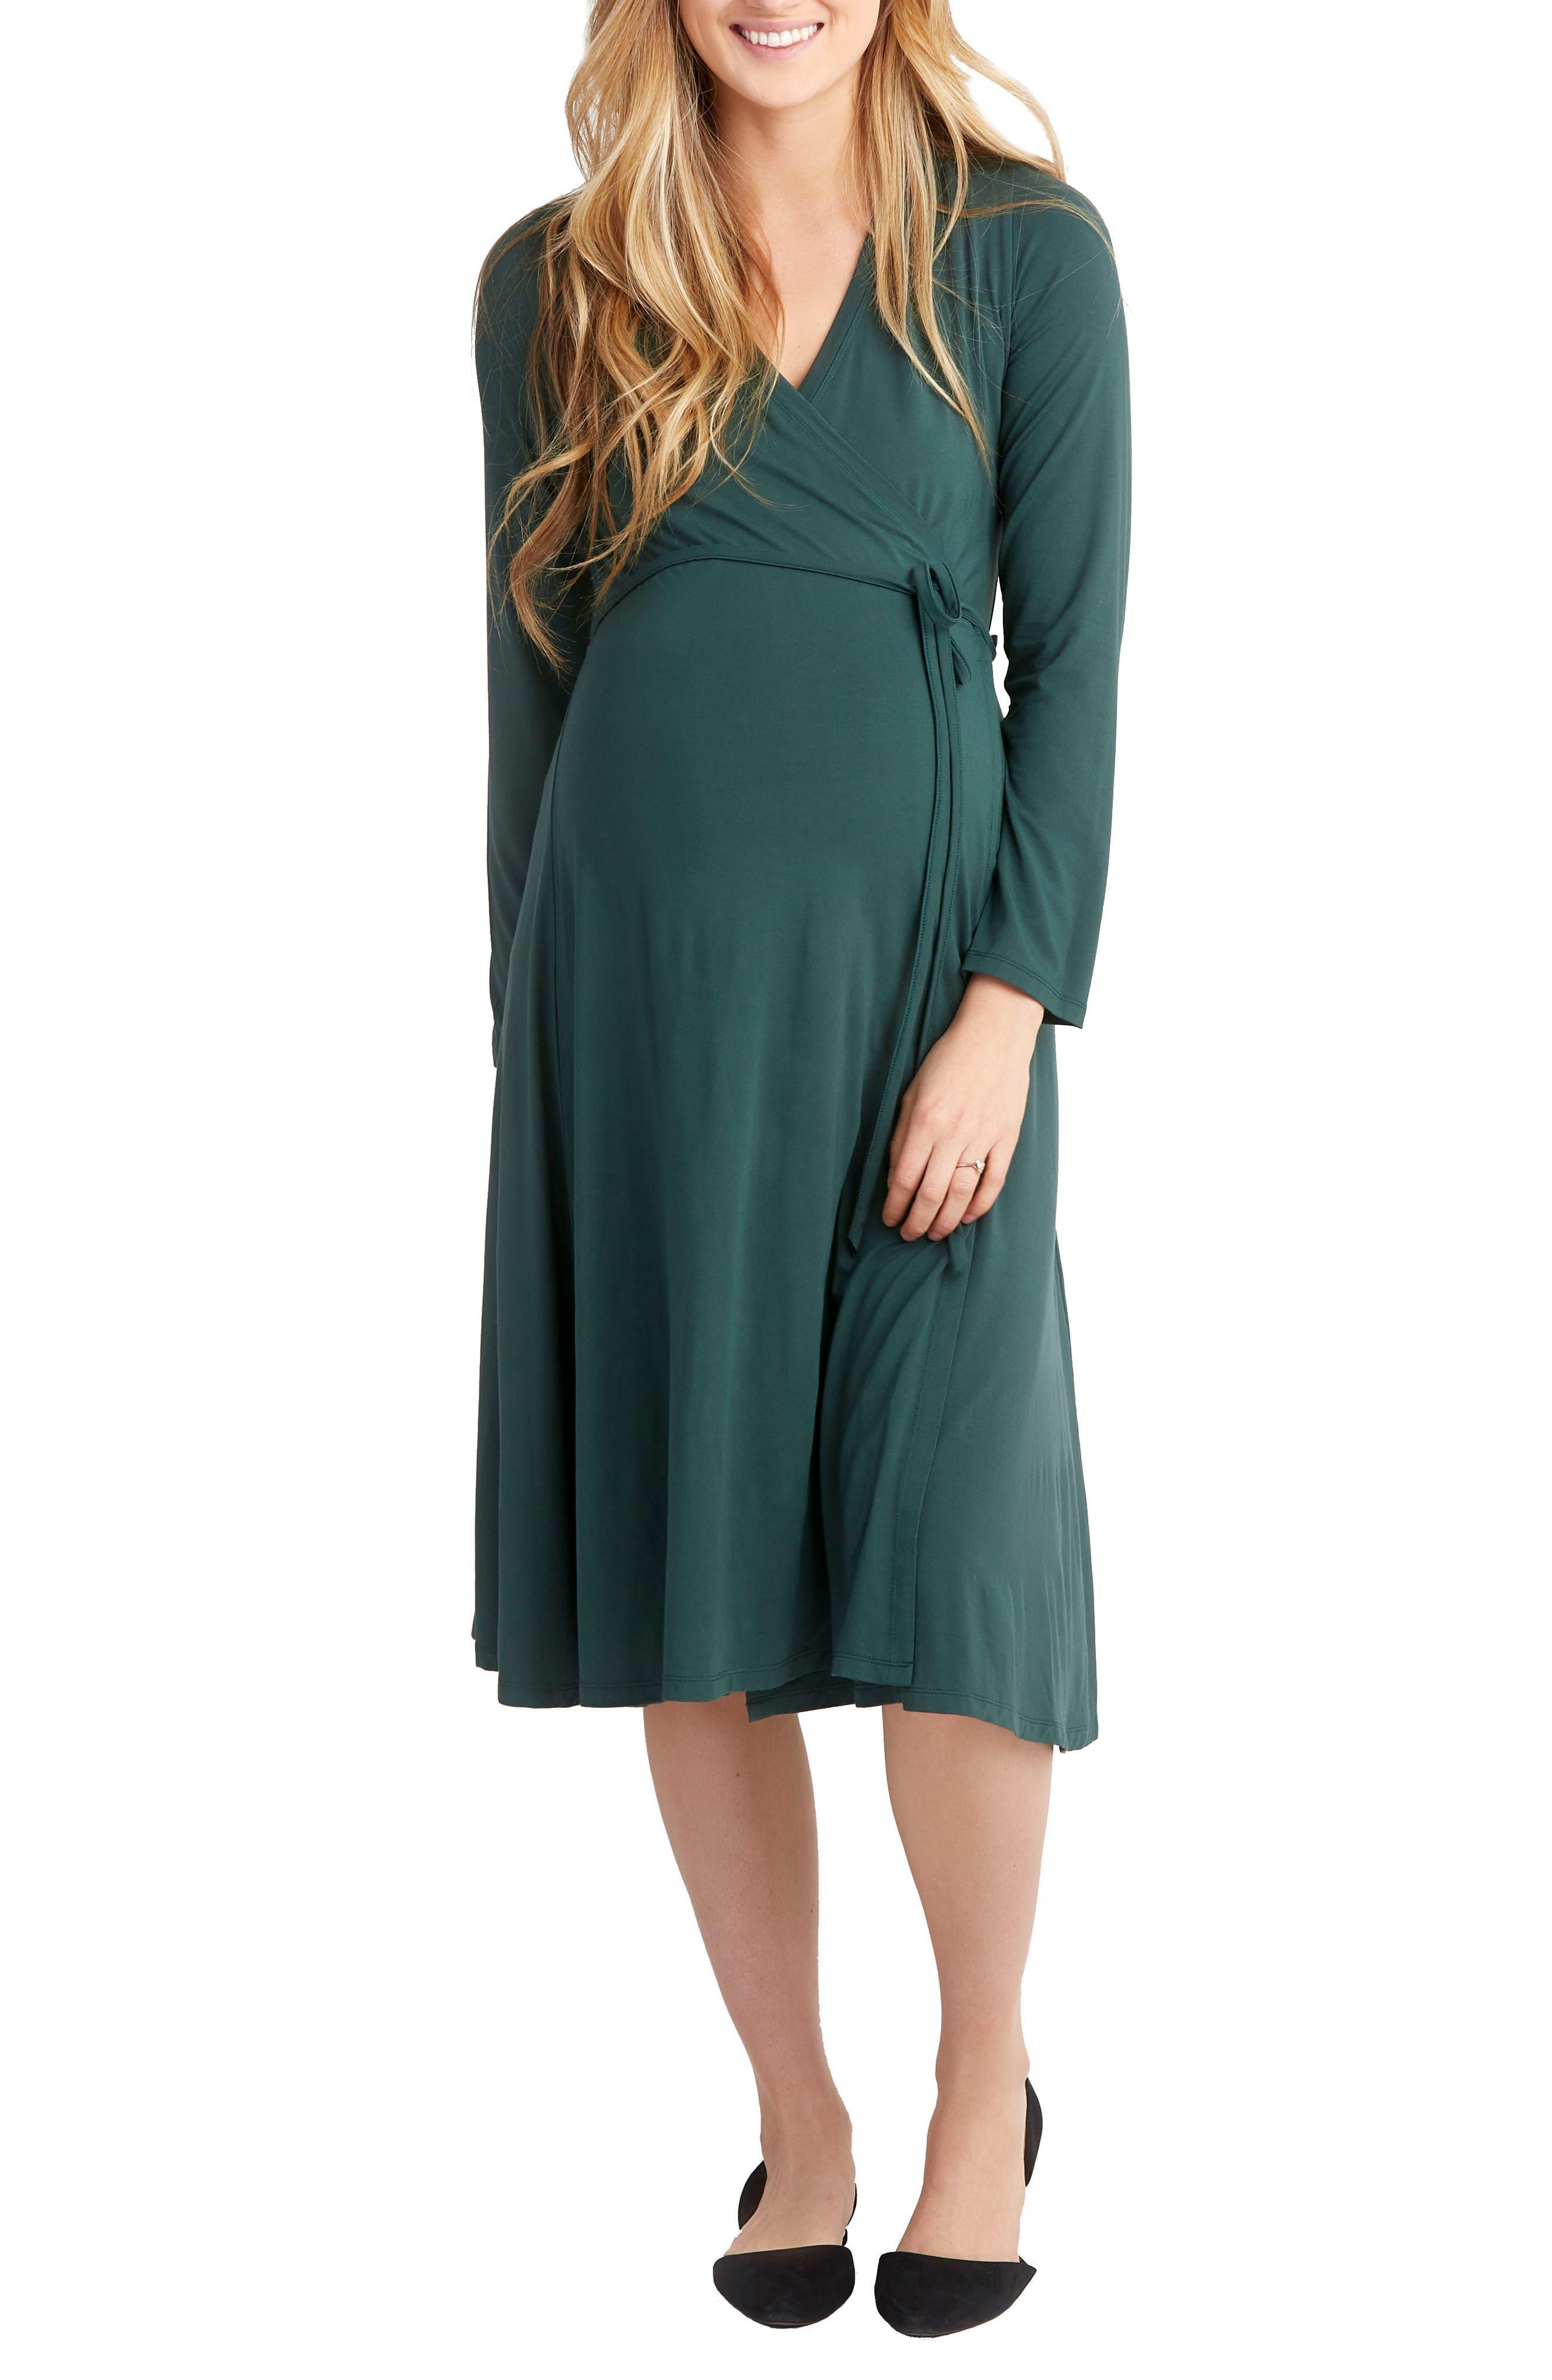 Kelly Green Maternity Dresses